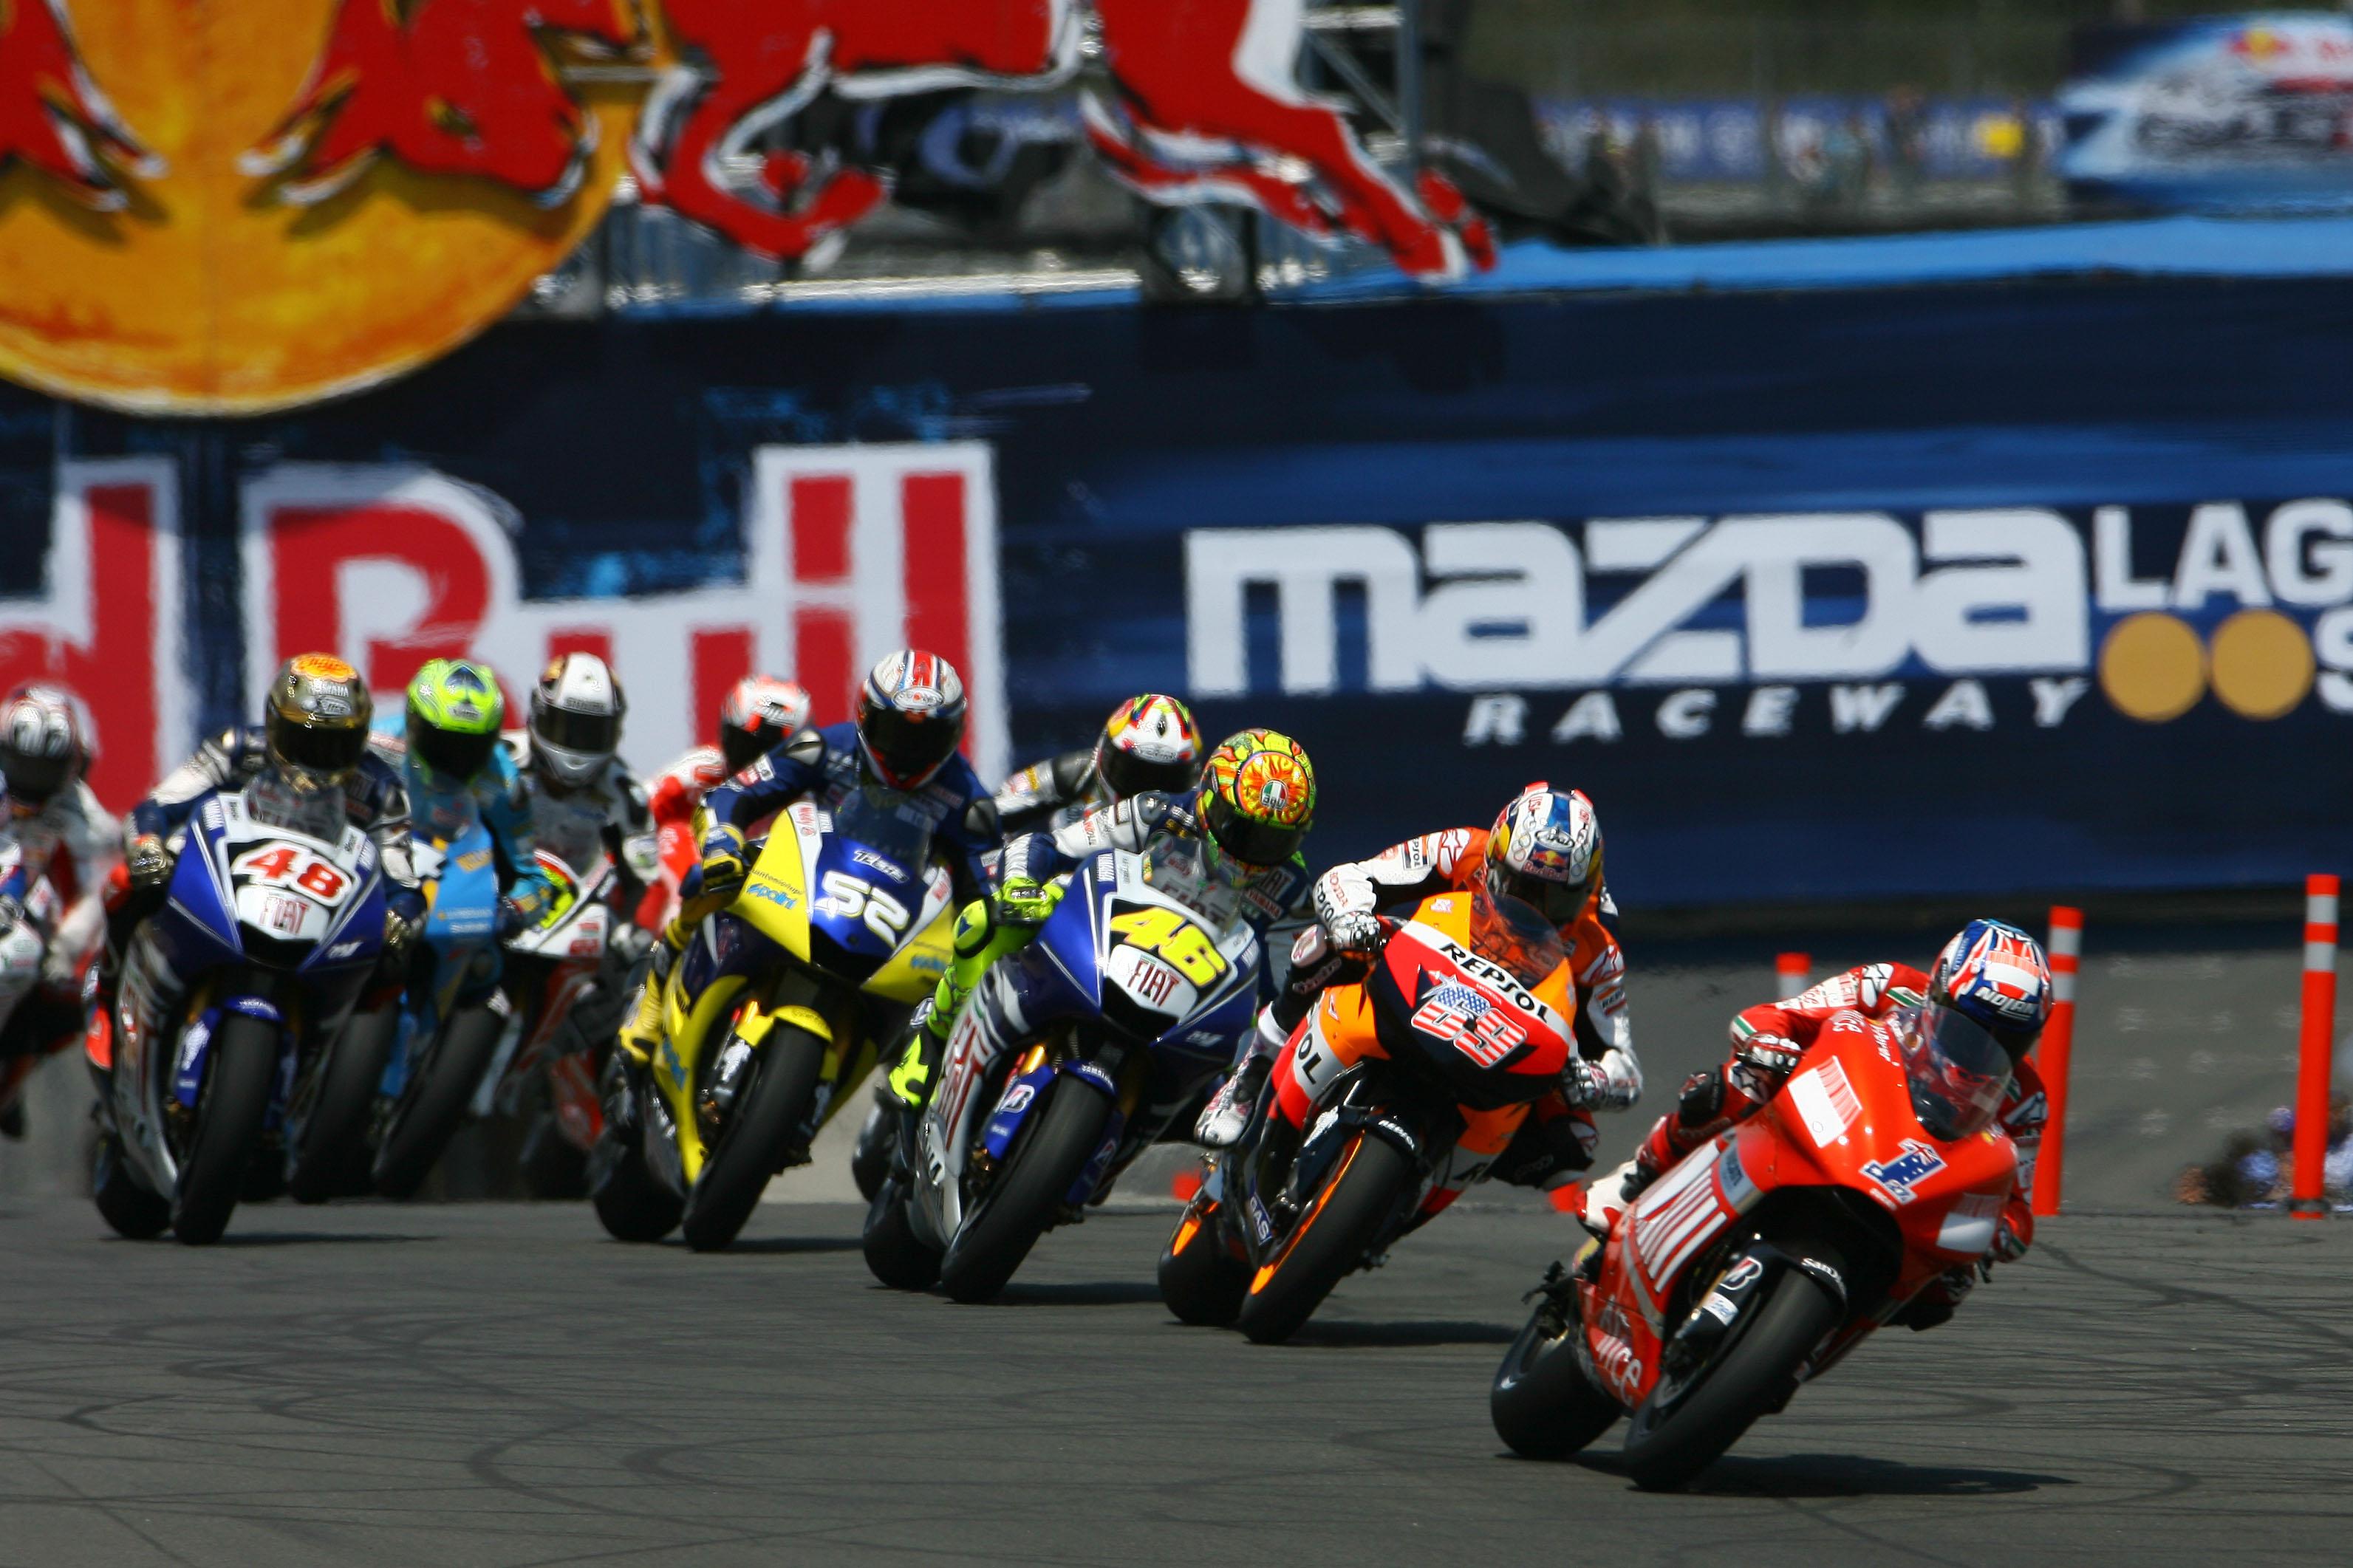 Laguna Seca MotoGP 2008